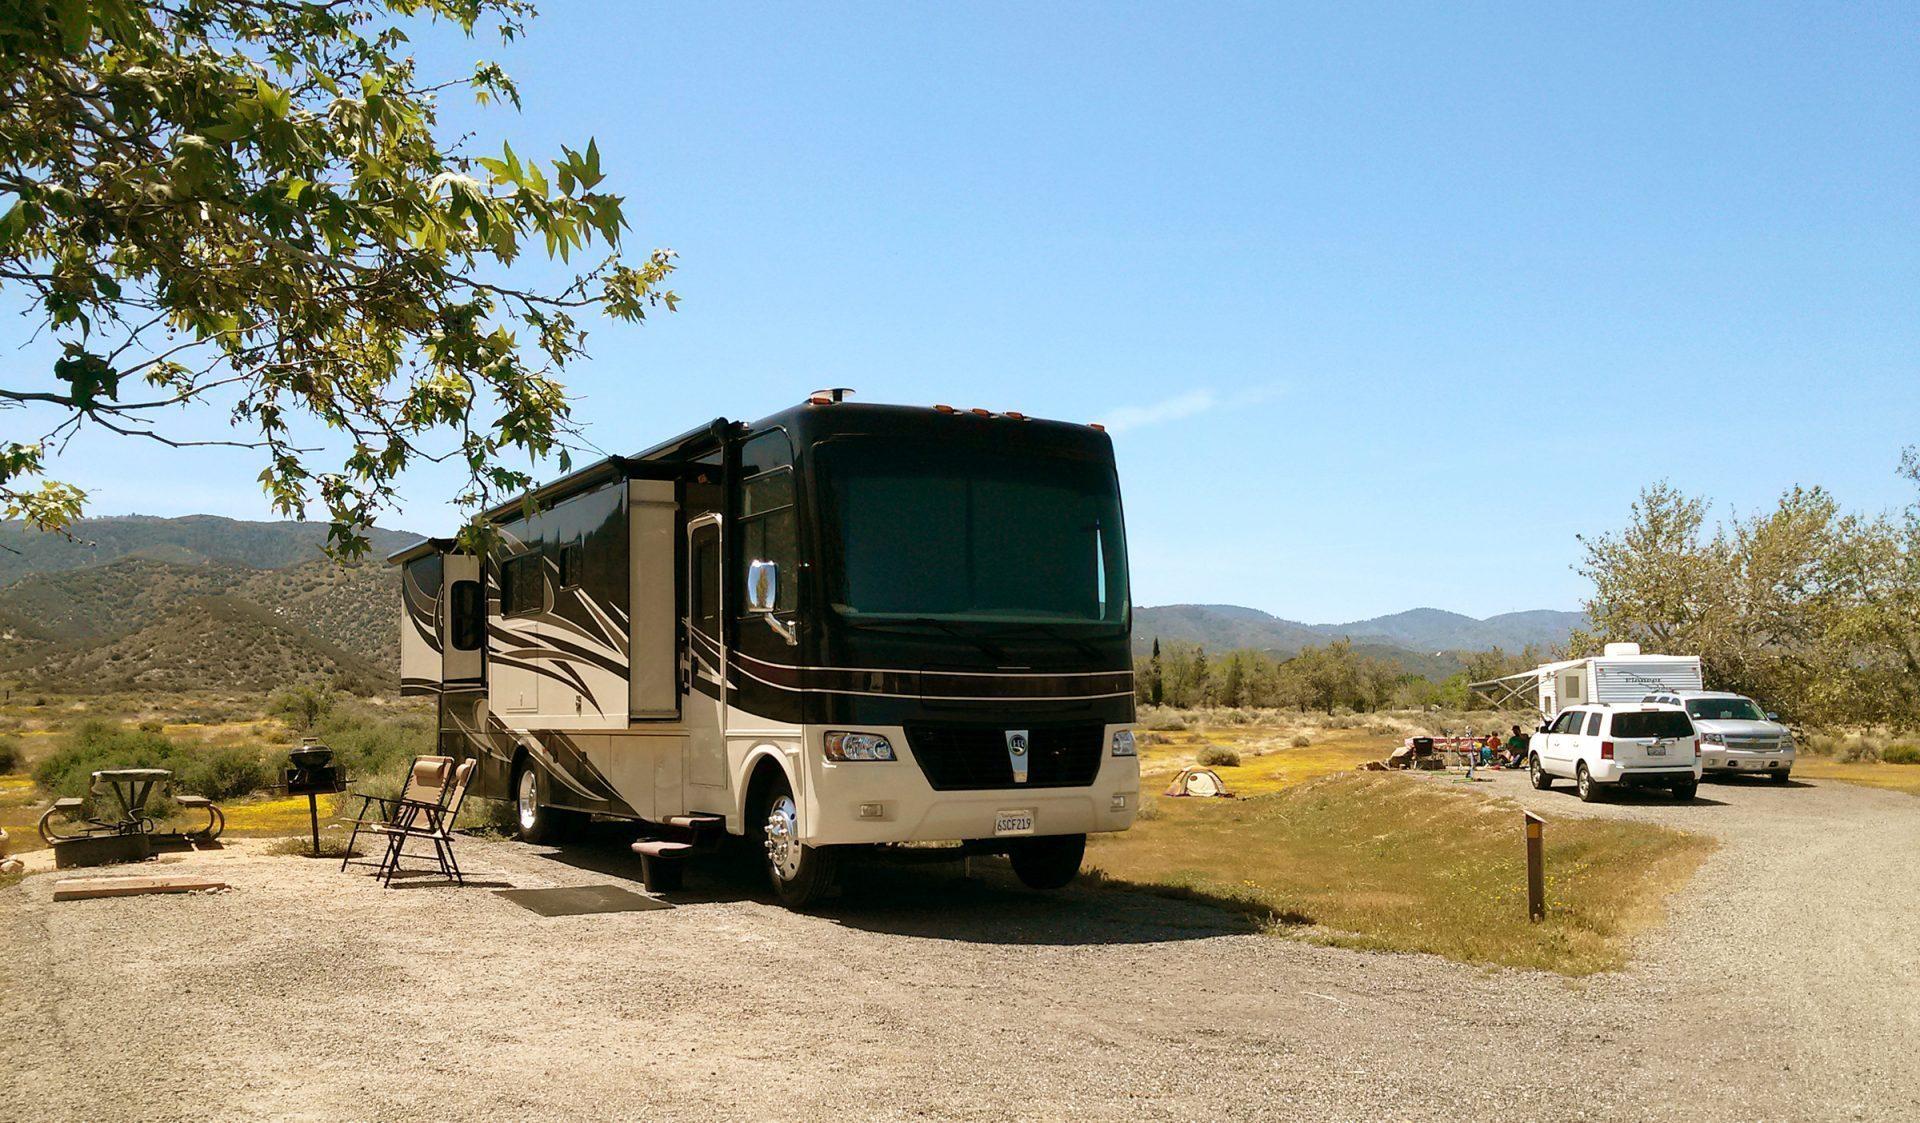 RV at Mojave River Forks